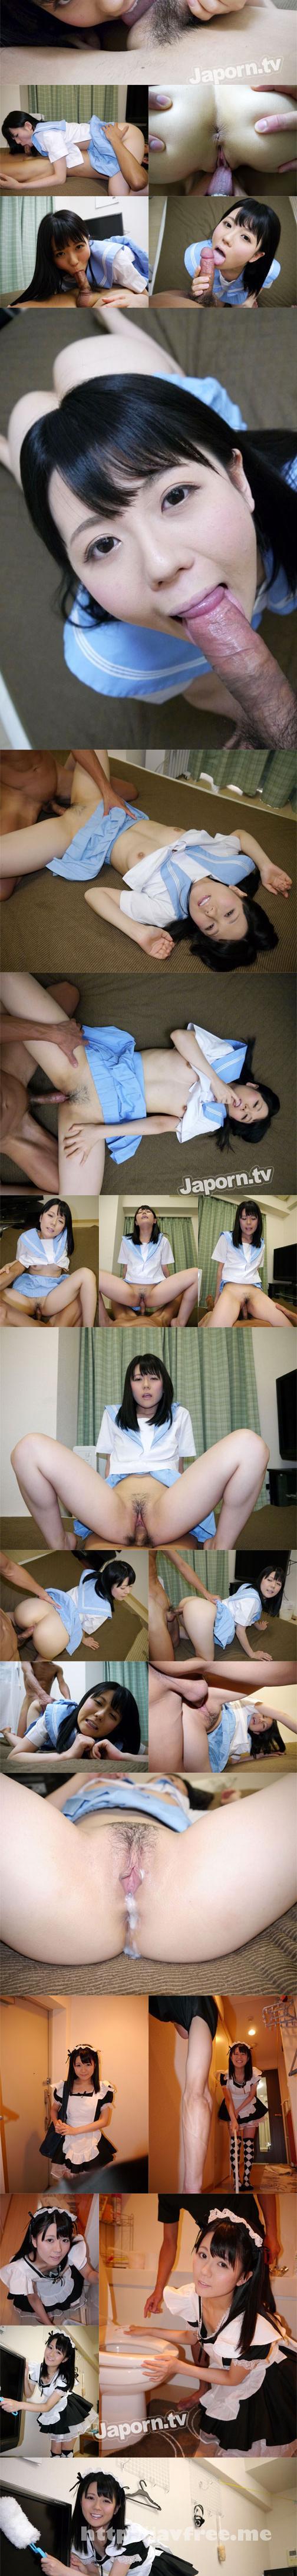 [RHJ 381] レッドホットジャム Vol.381 制服時代 ~私、遊ばれちゃった~ : 荒木まい 荒木まい RHJ Mai Araki